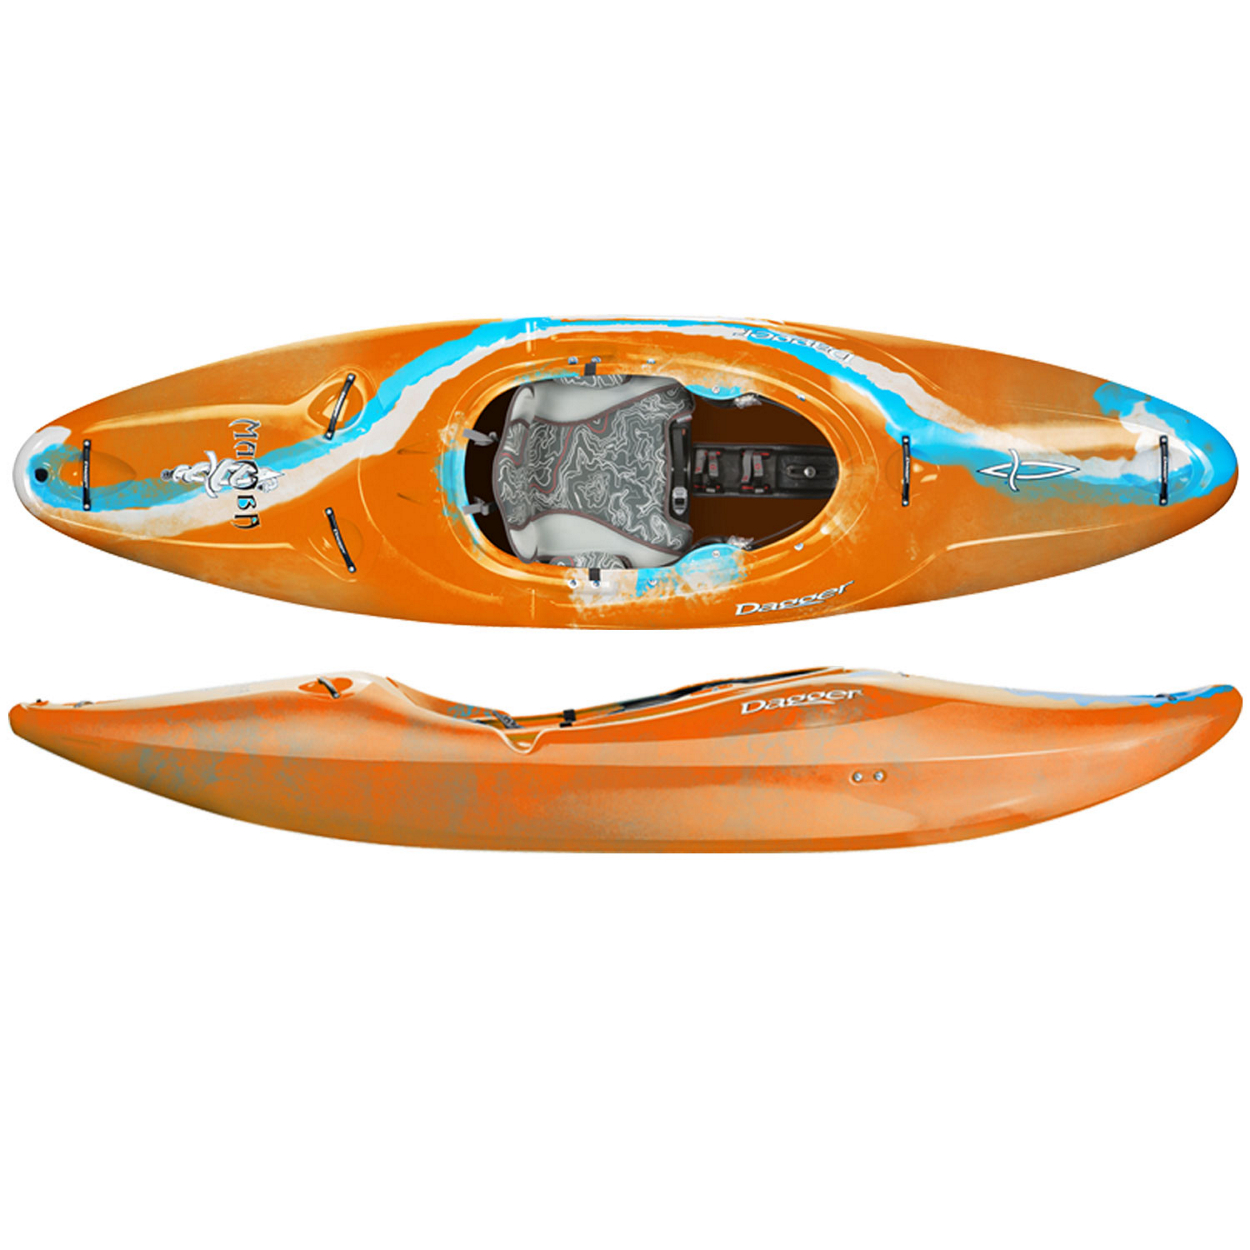 Whitewater Kayaks For Sale >> Shop Whitewater River Kayaks For Sale At Austin Kayak Ack